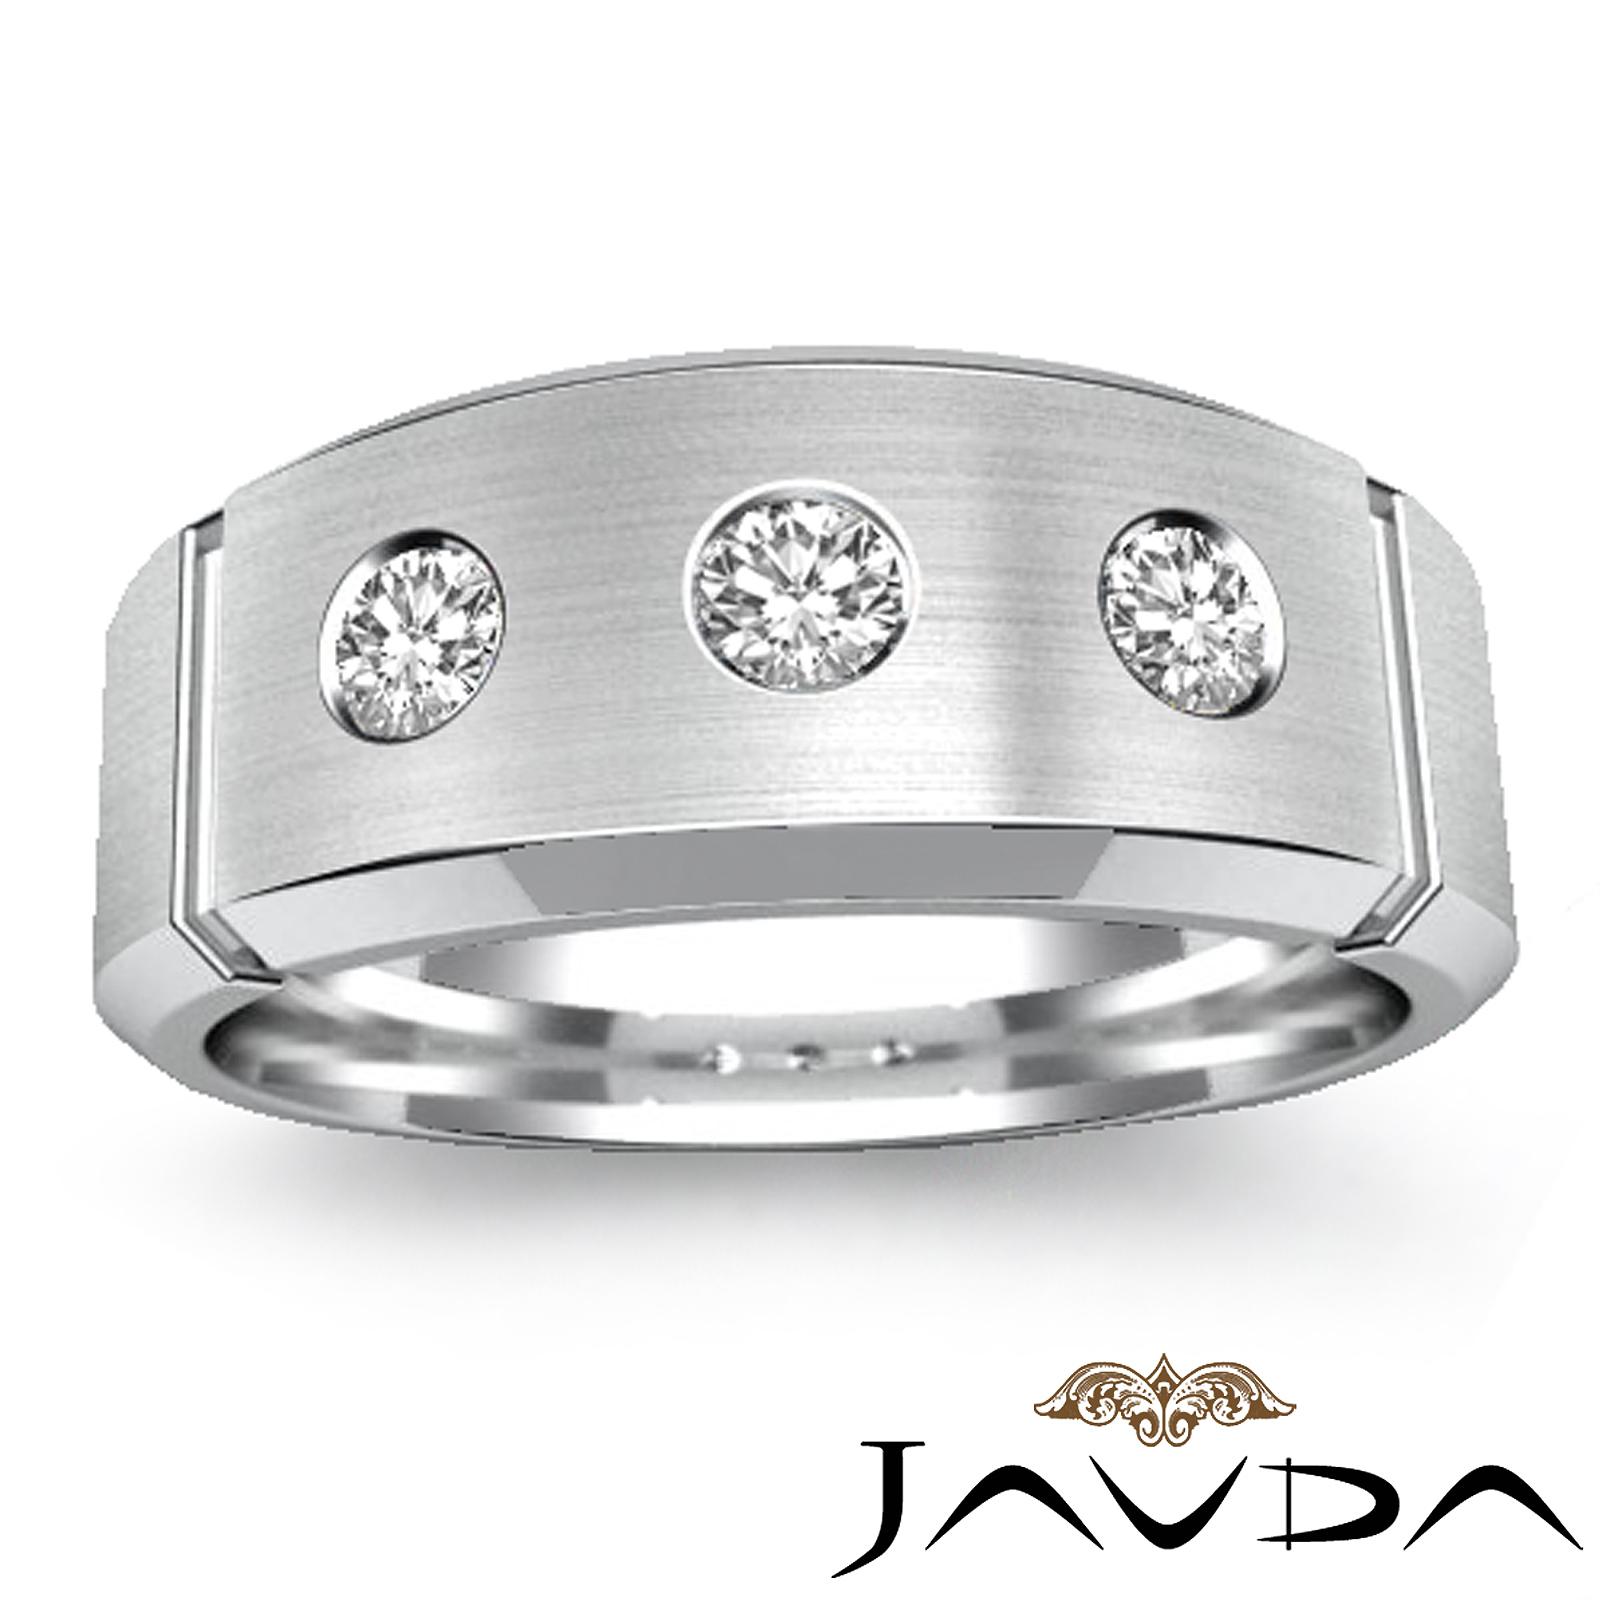 8mm Mens Half Wedding Band 3 Stone Round Bezel Diamond Ring